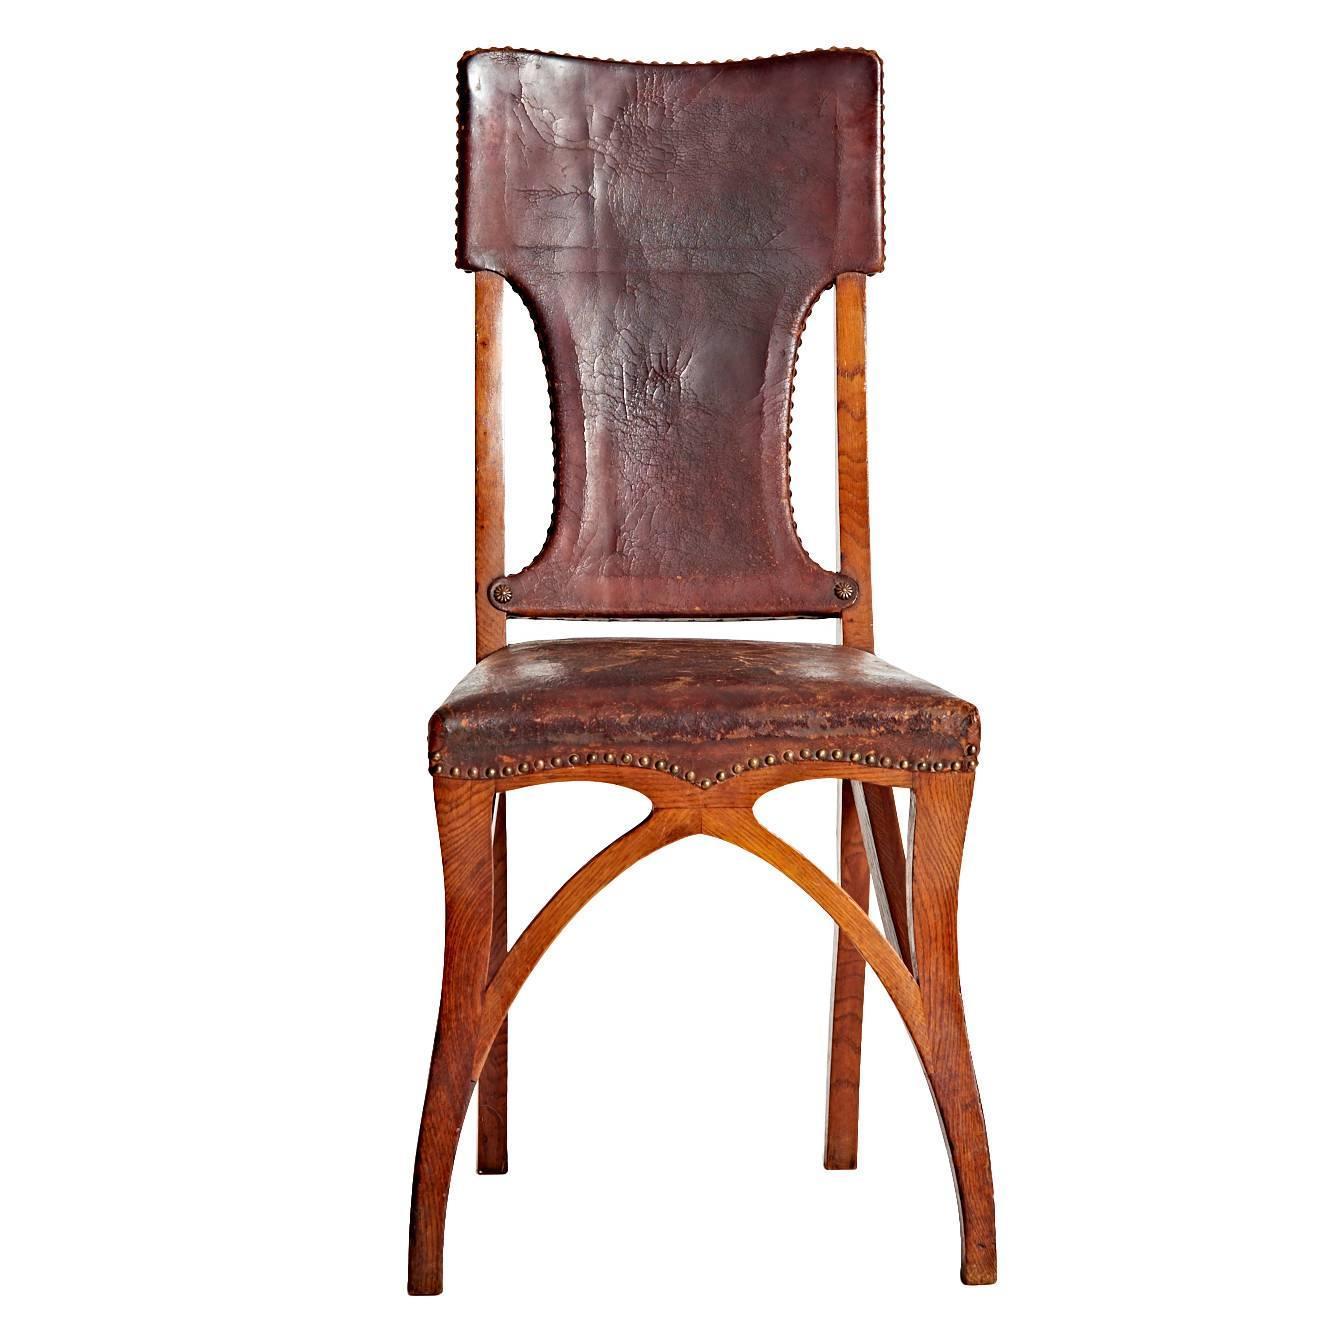 Eugene Gaillard Furniture Design